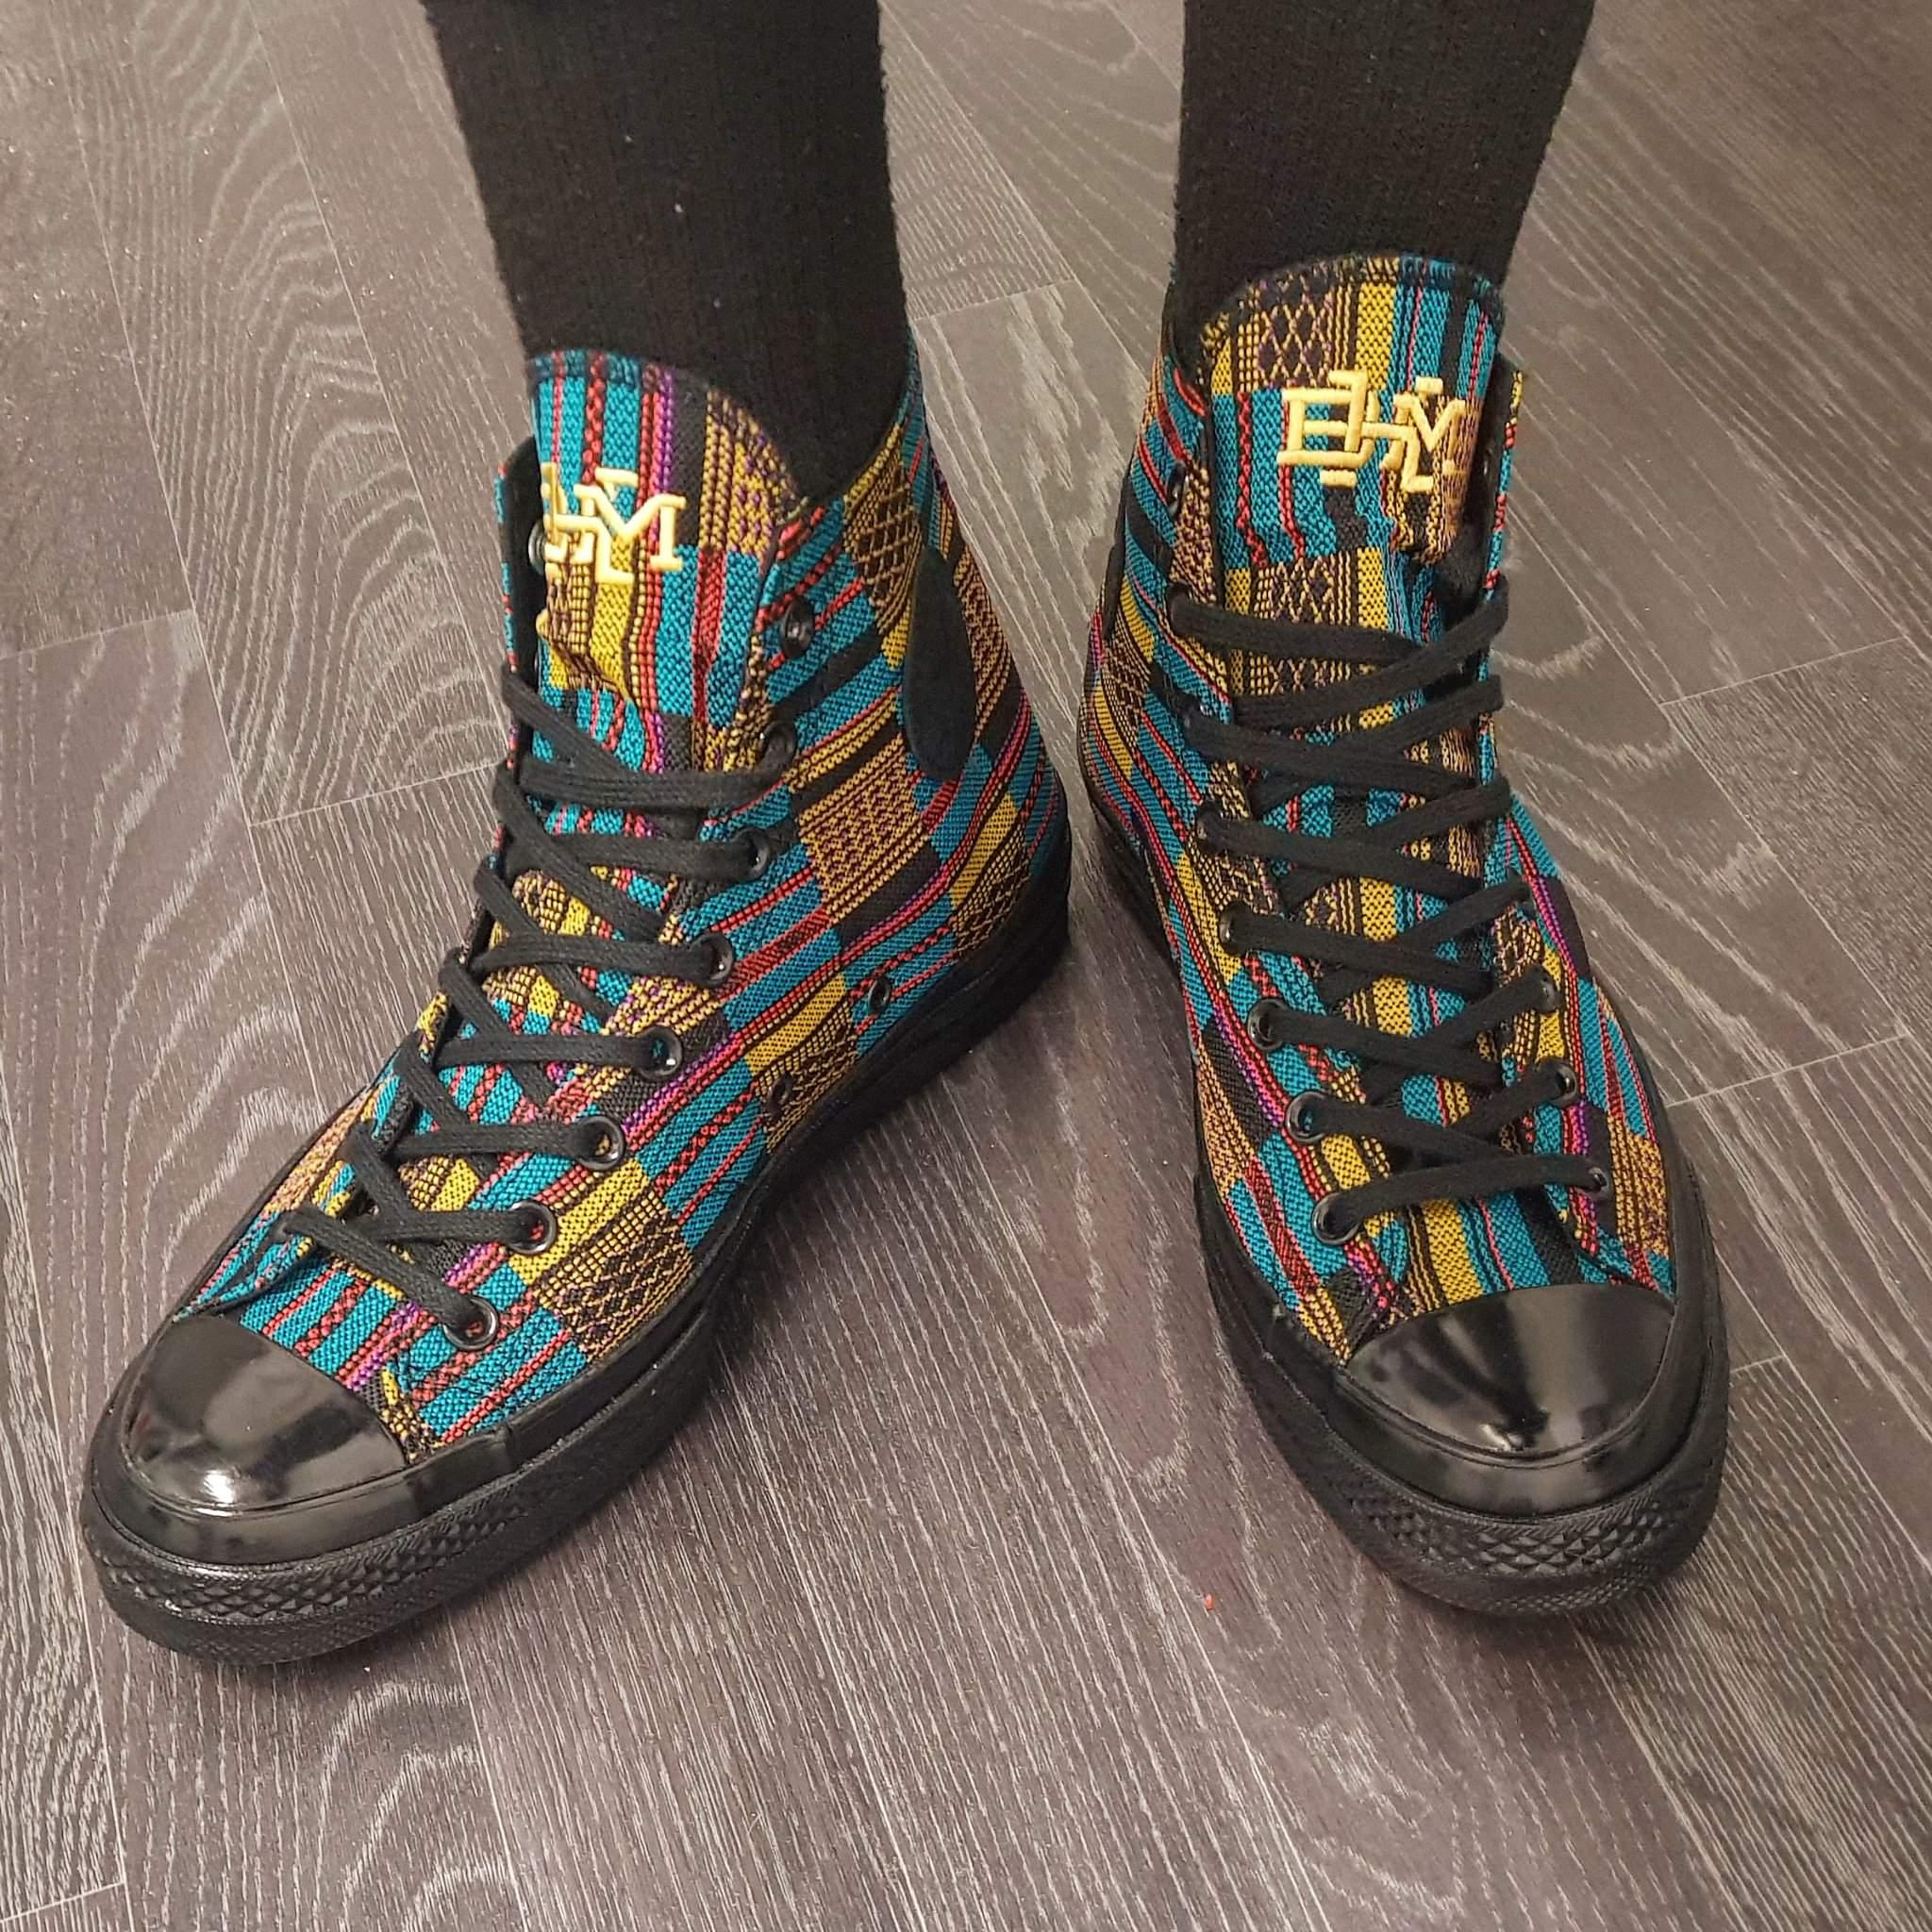 History Month Converse   Sneakerheads Amino